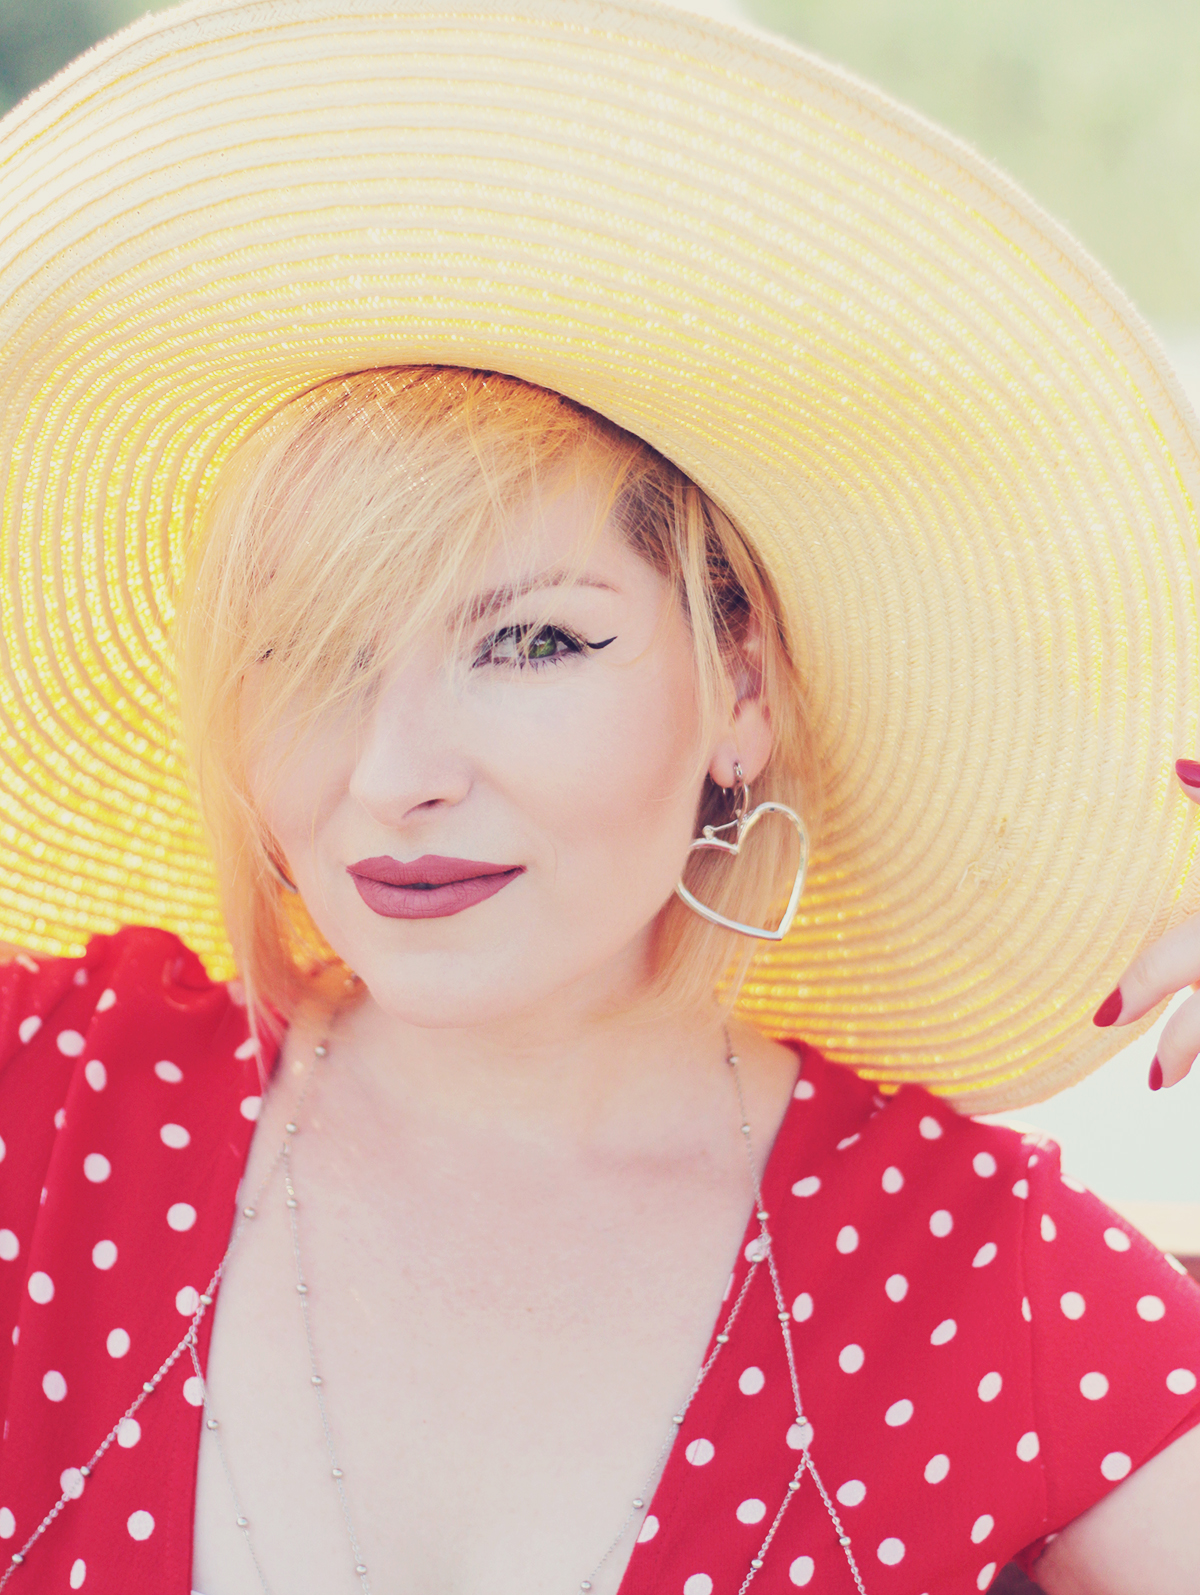 red polka dot dress, straw hat, matte lips, make-up, summer